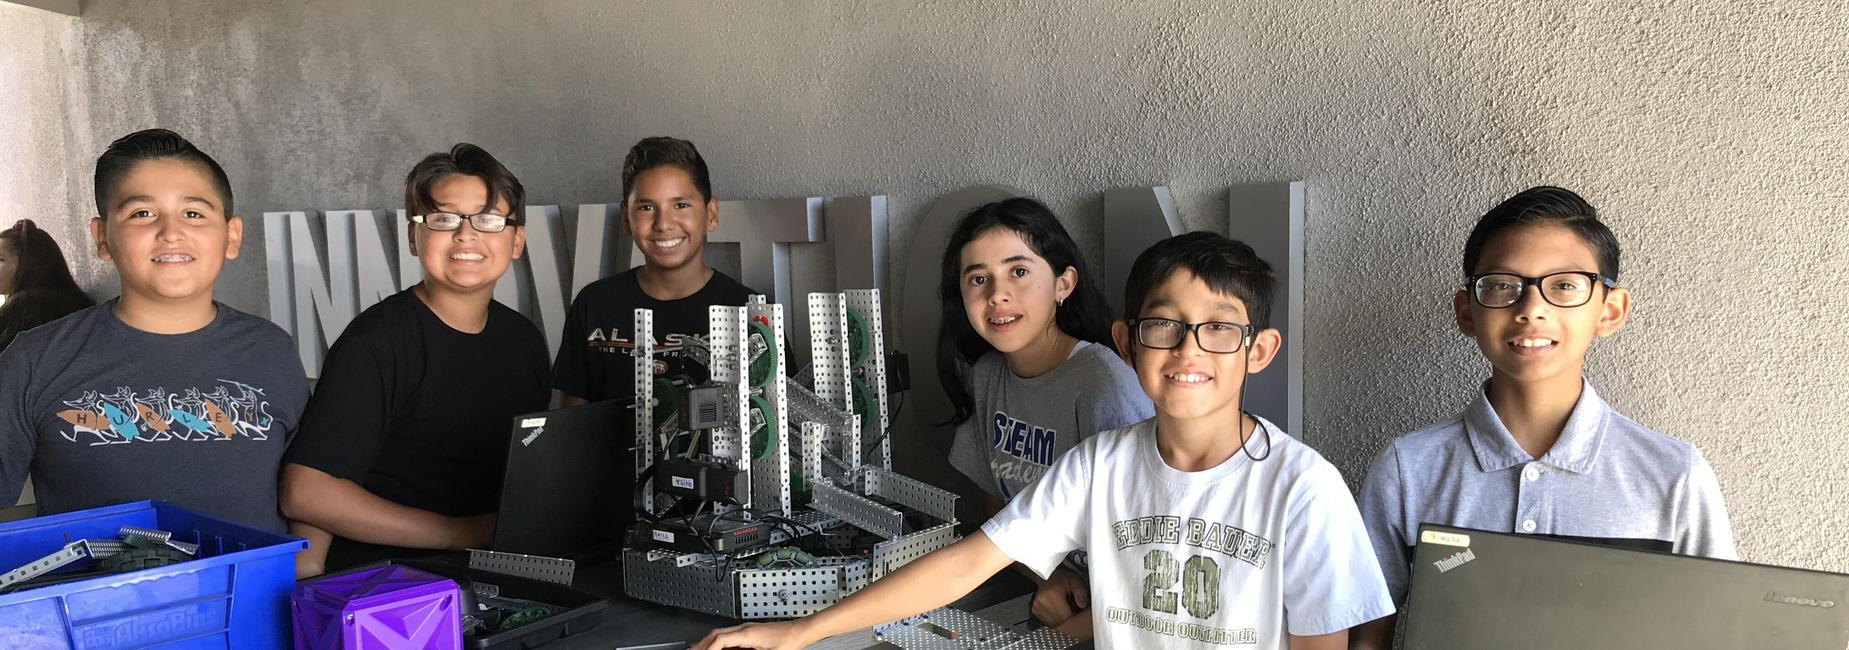 Summer Robotics Showcase